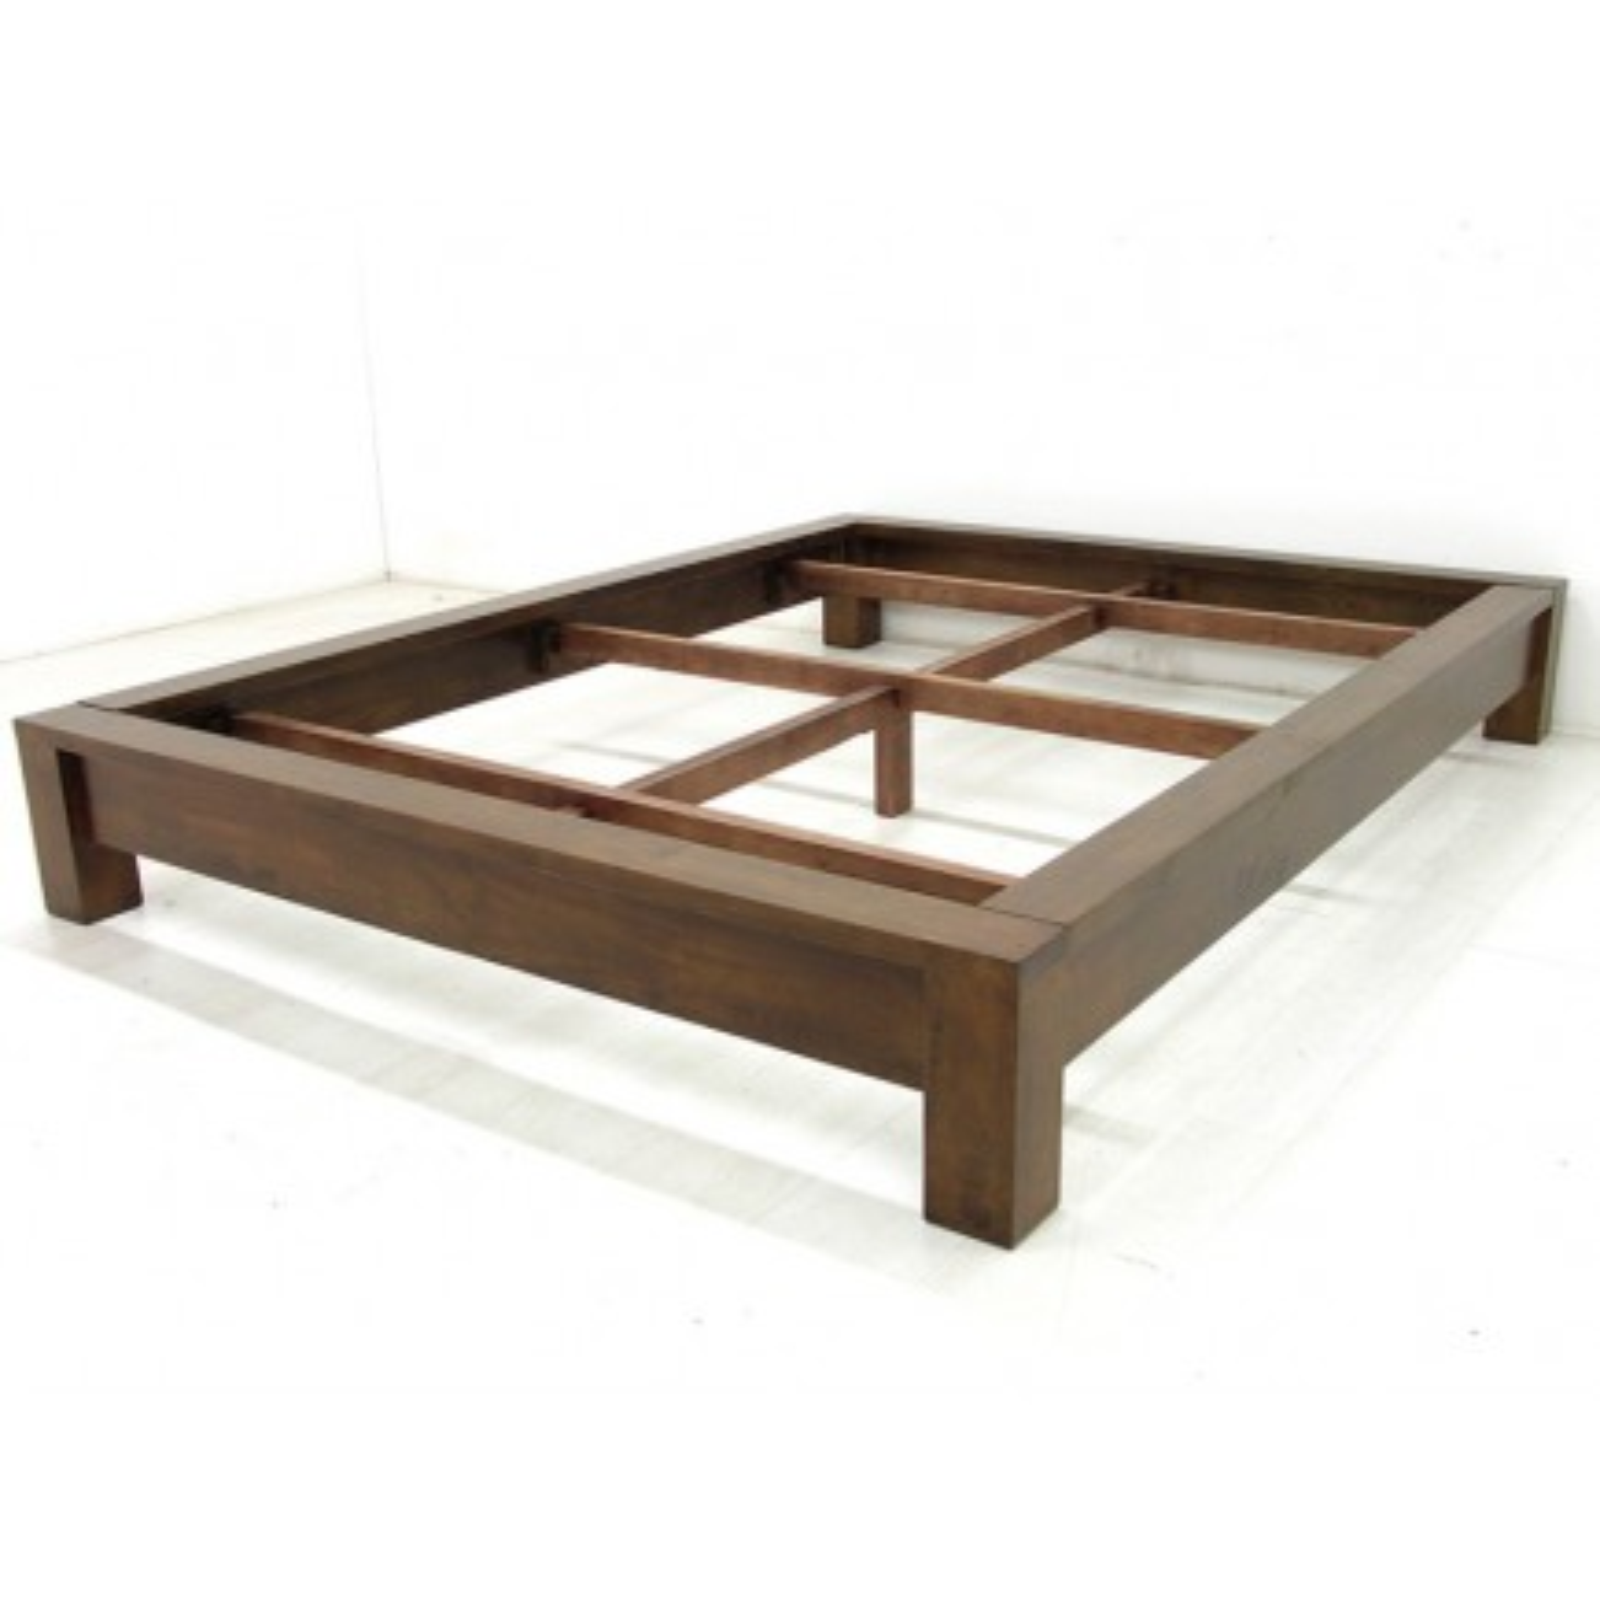 Lit 140 Omega Hévéa - meuble style design